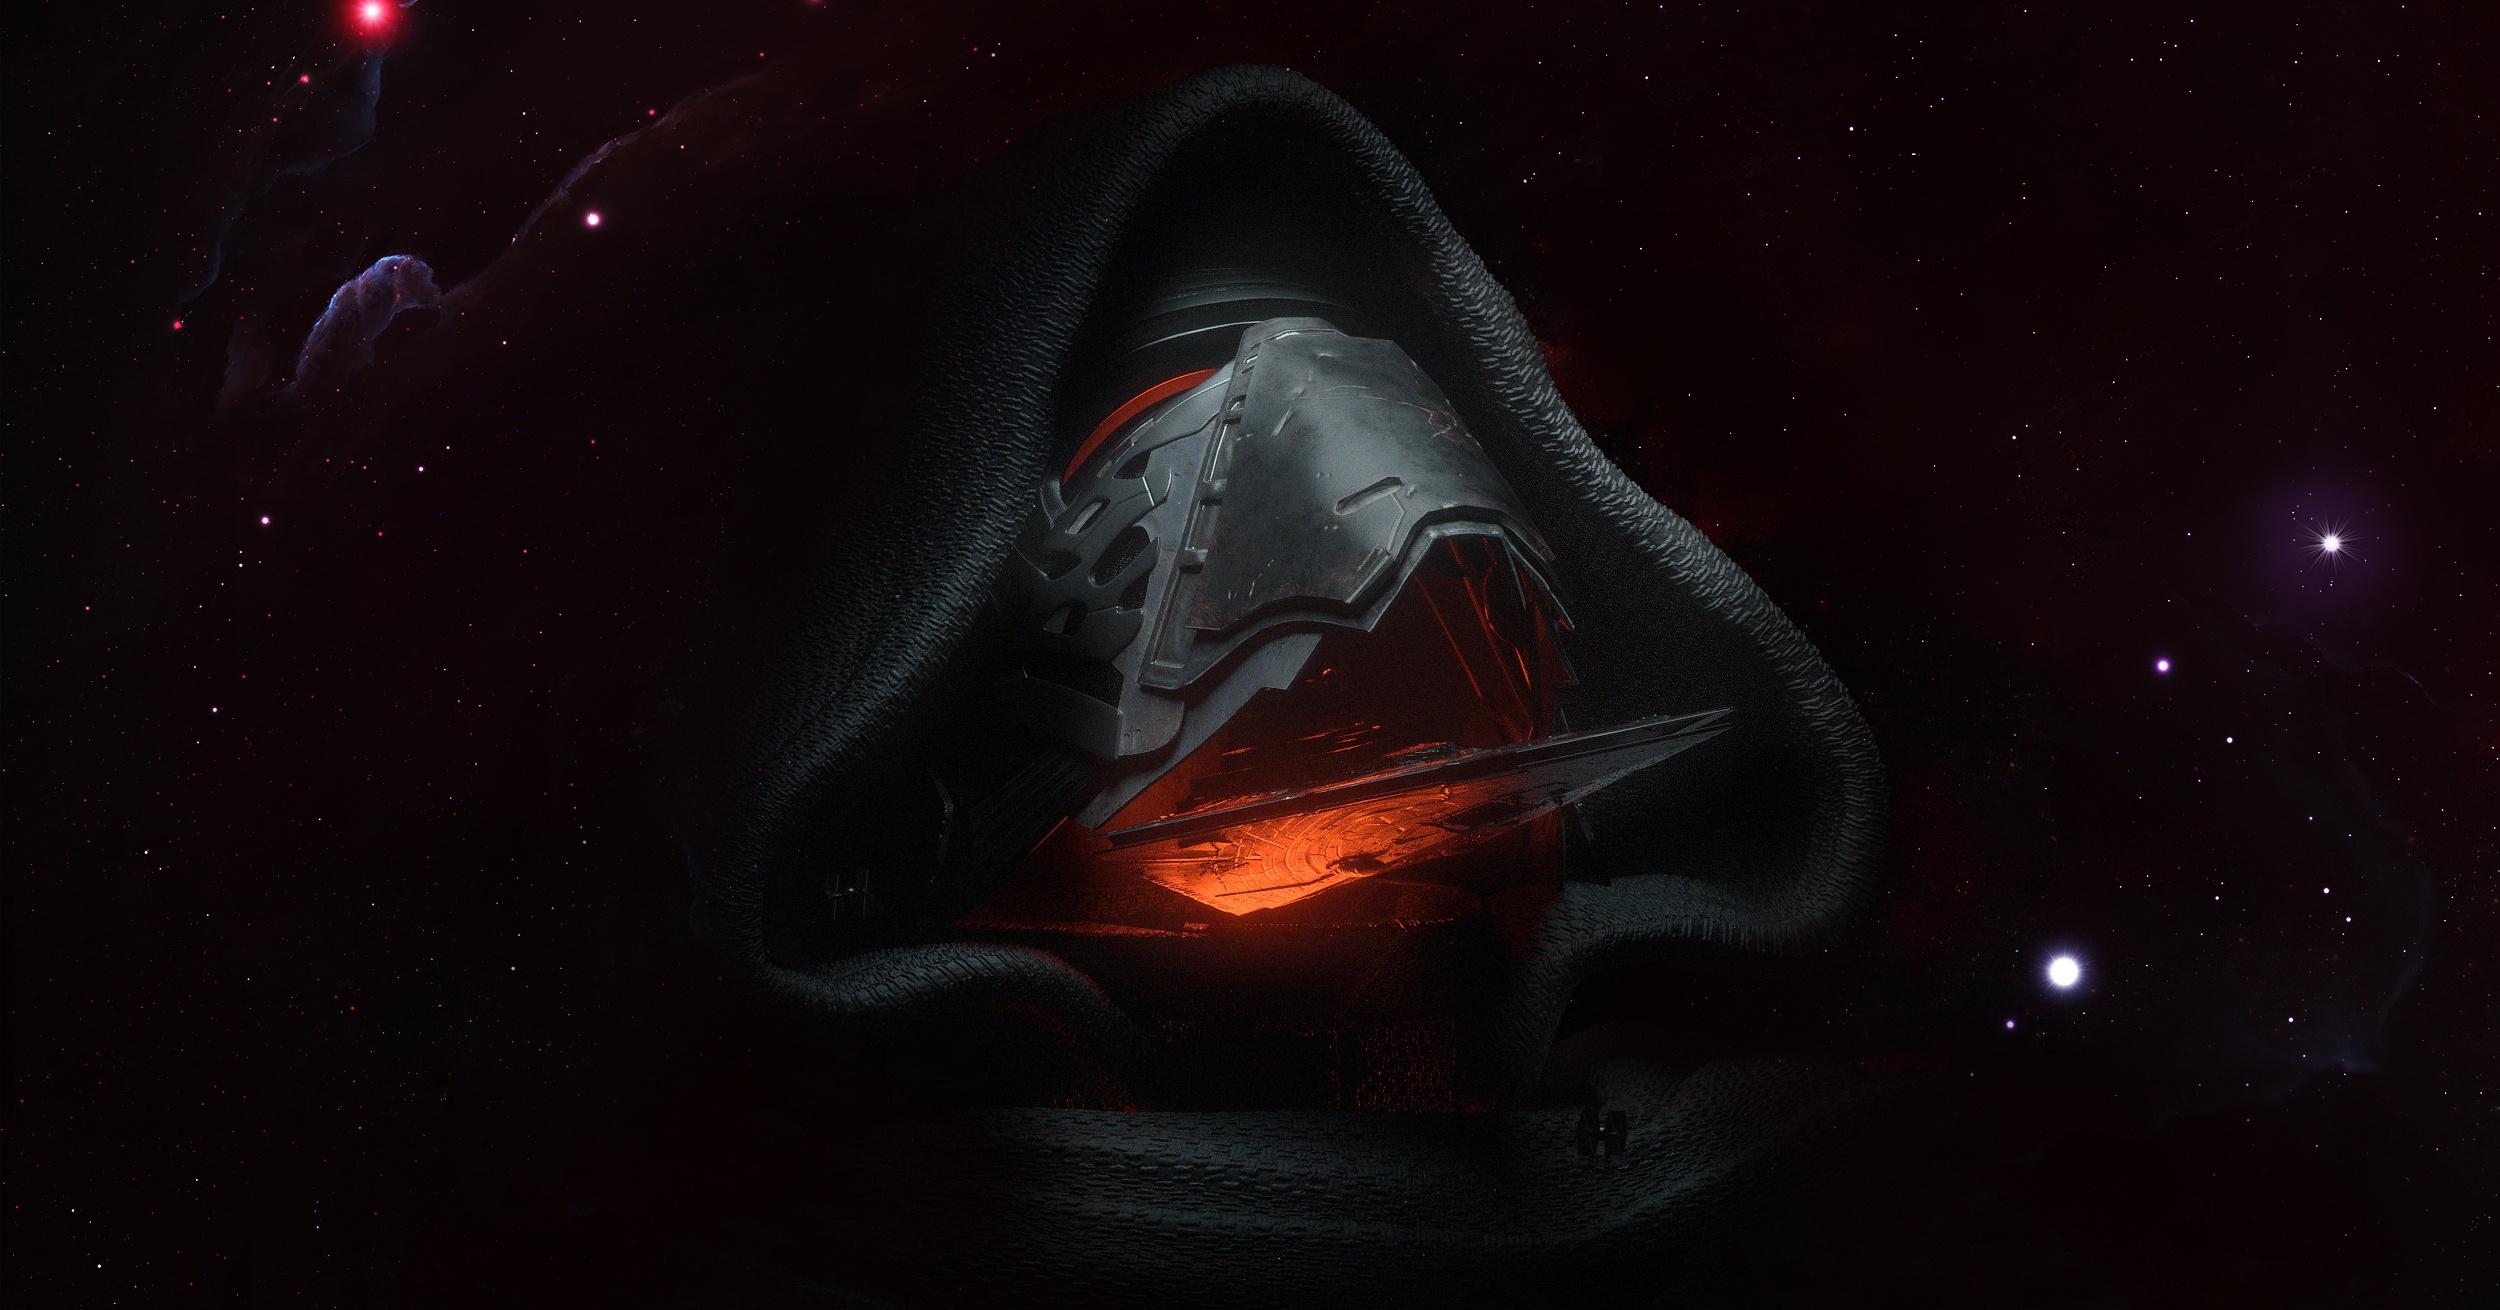 General 2500x1310 dark artwork Star Wars Star Wars Ships mask science fiction digital art Kylo Ren